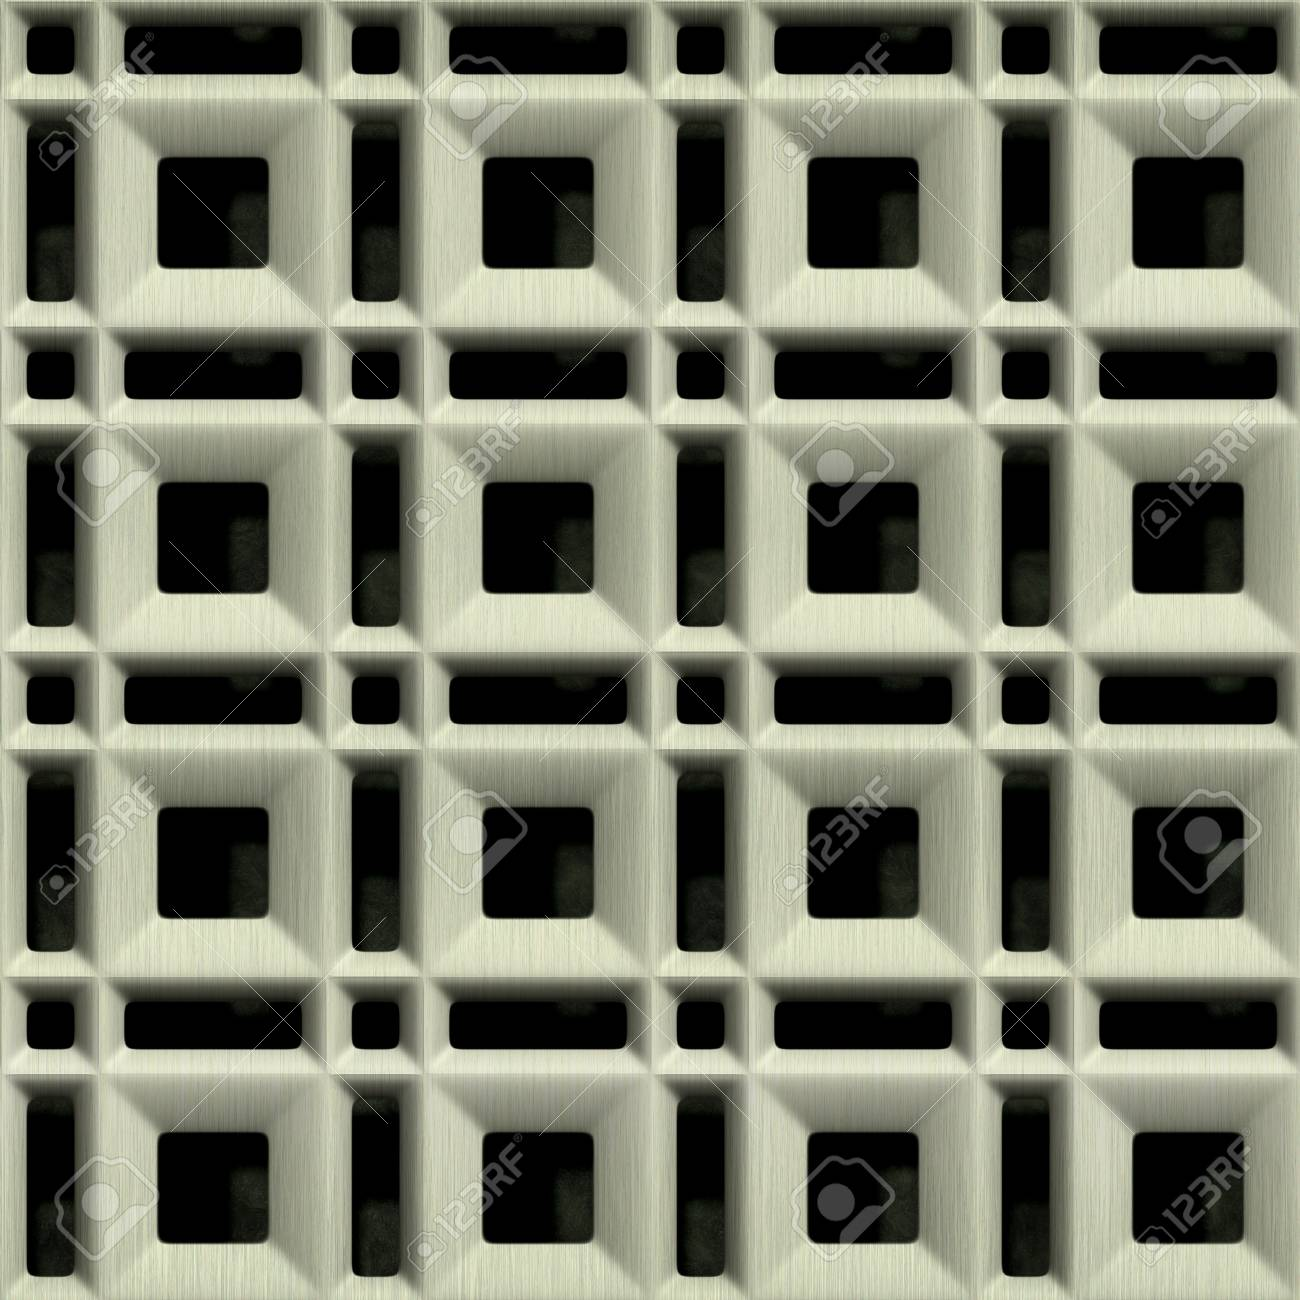 Steel grate. Seamless texture. Stock Photo - 15823475